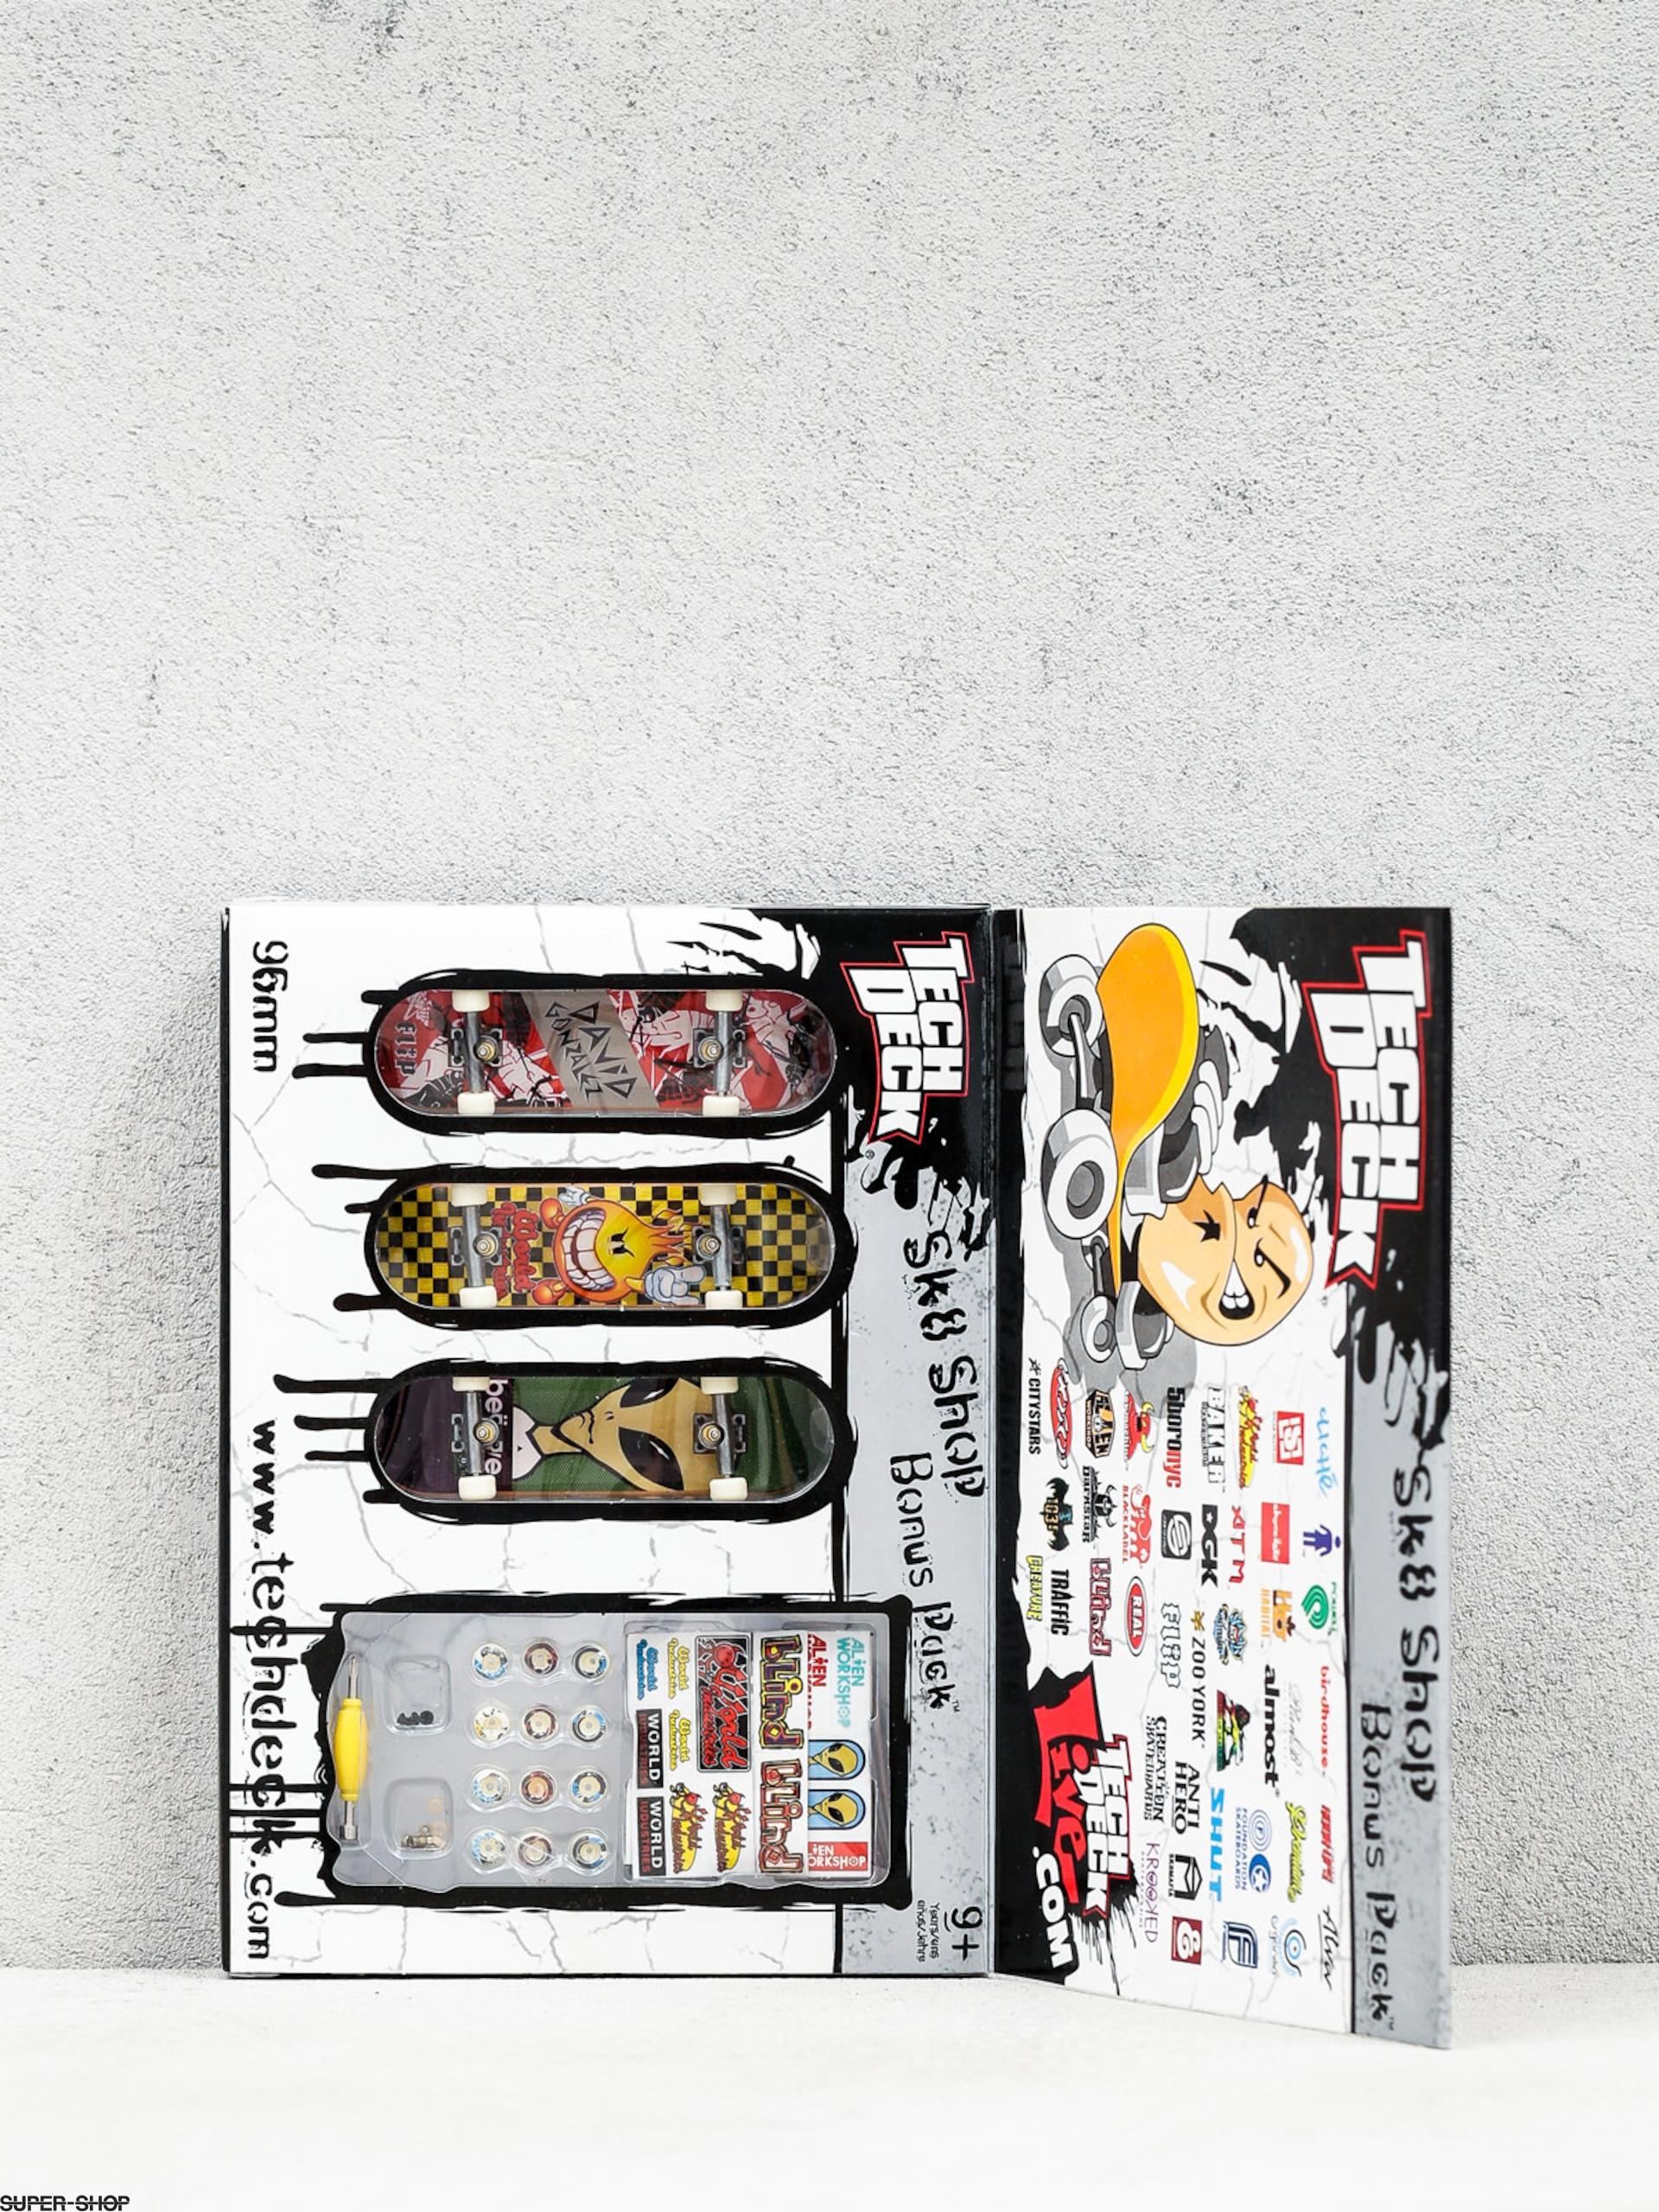 852975-w1920-tech-deck-set-sk8-shop-bonus-pack-flip-world-alien.jpg 8f90f2cfc4b